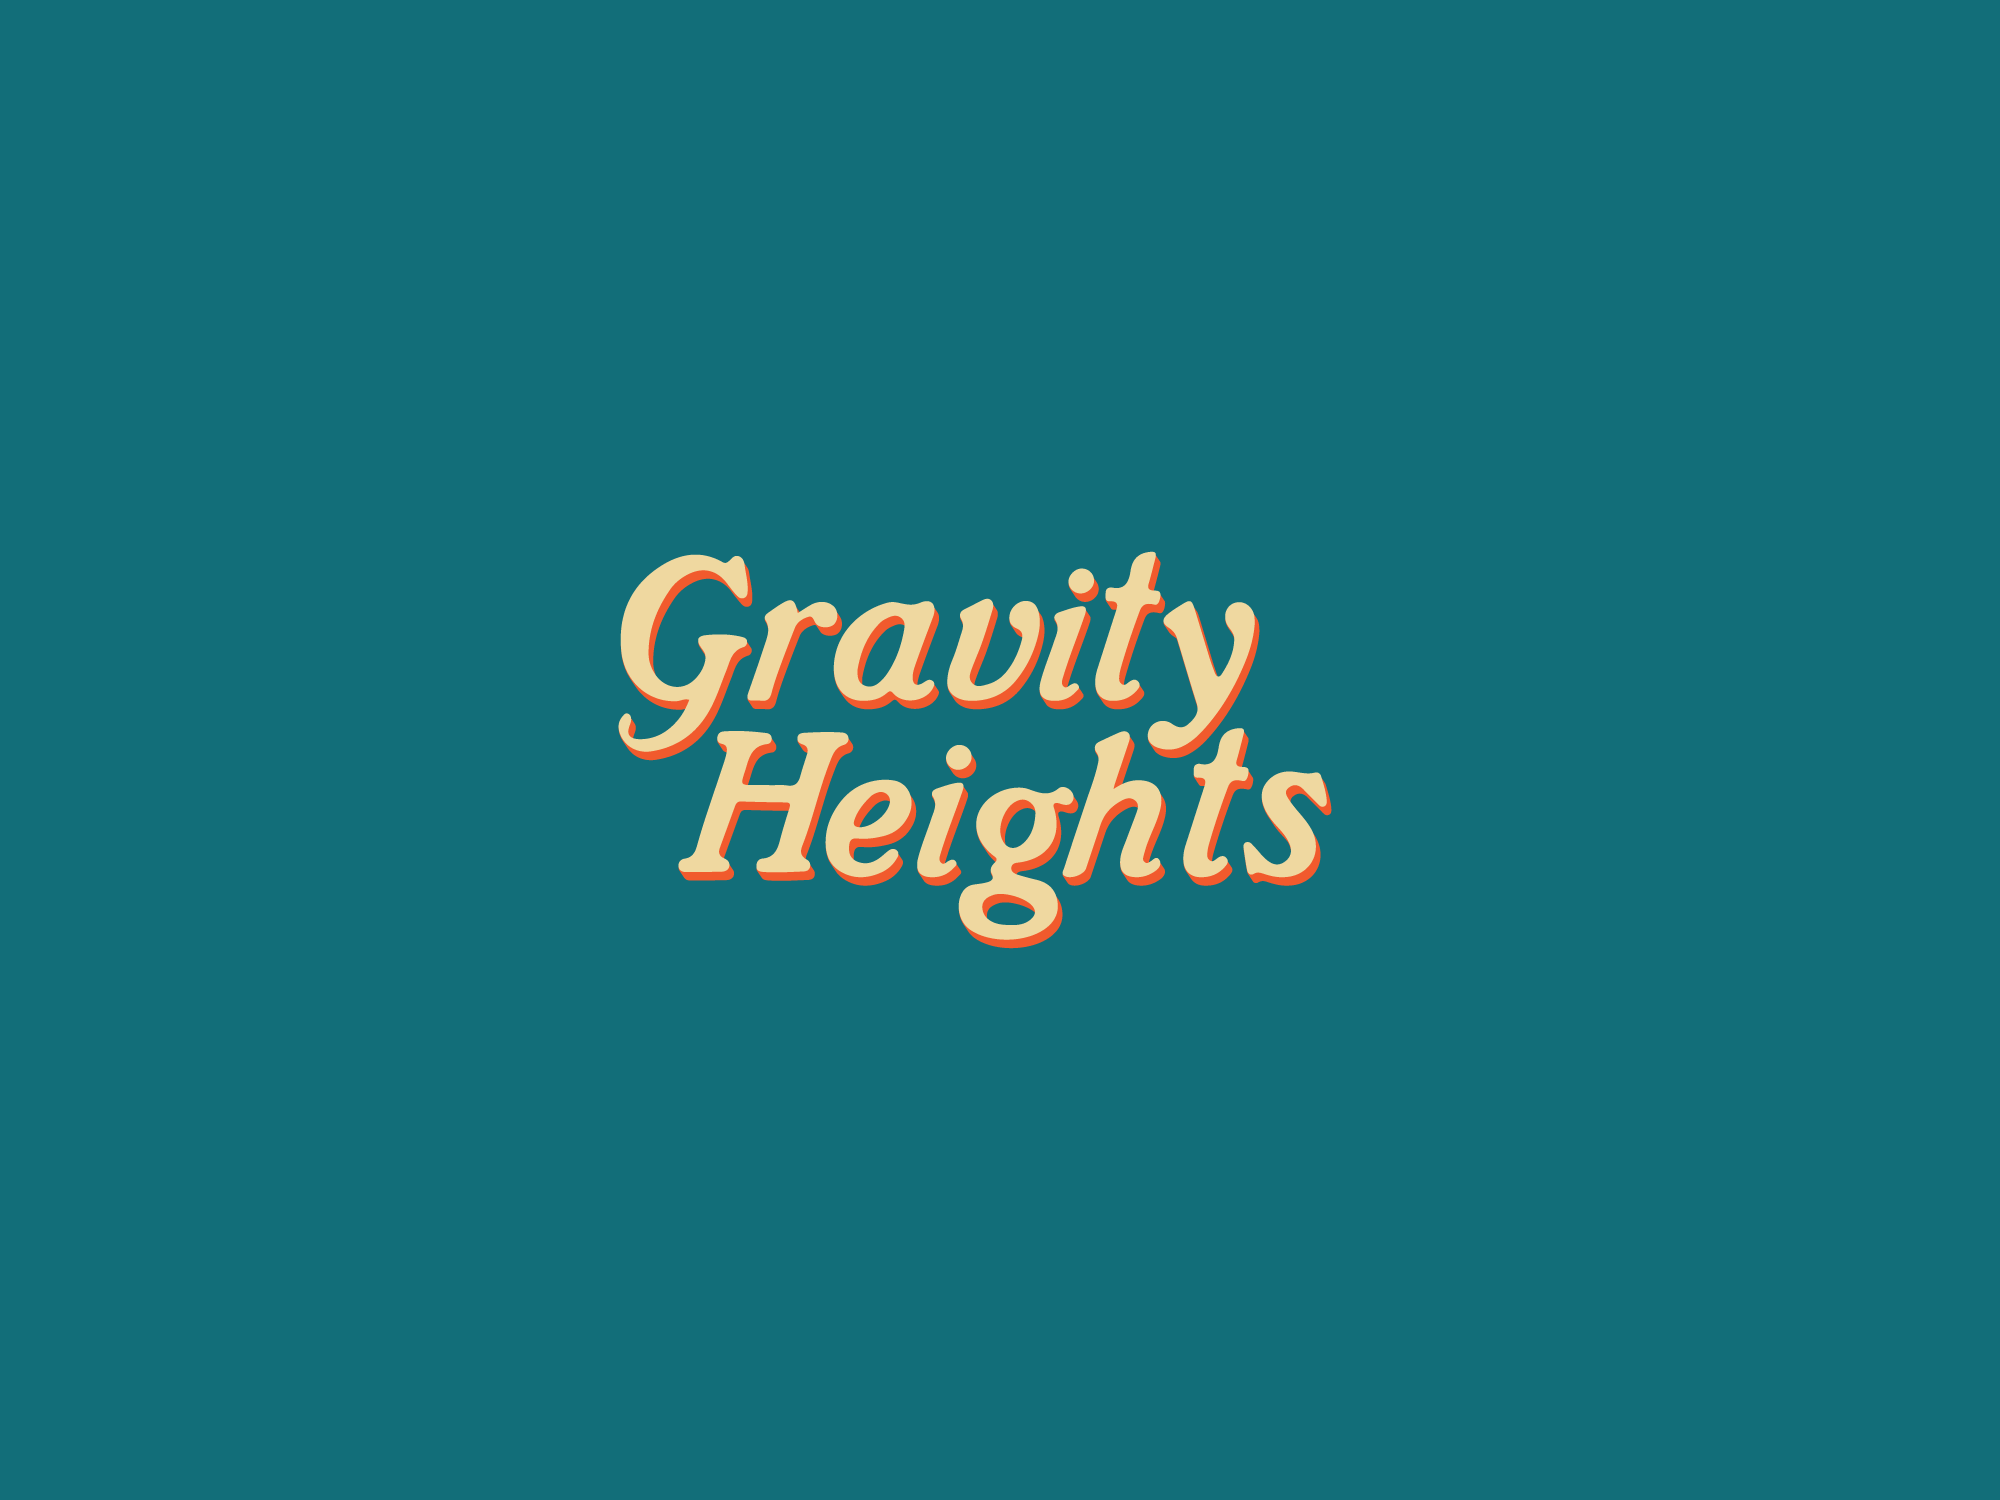 nicolabroderick_gravityheights.jpg